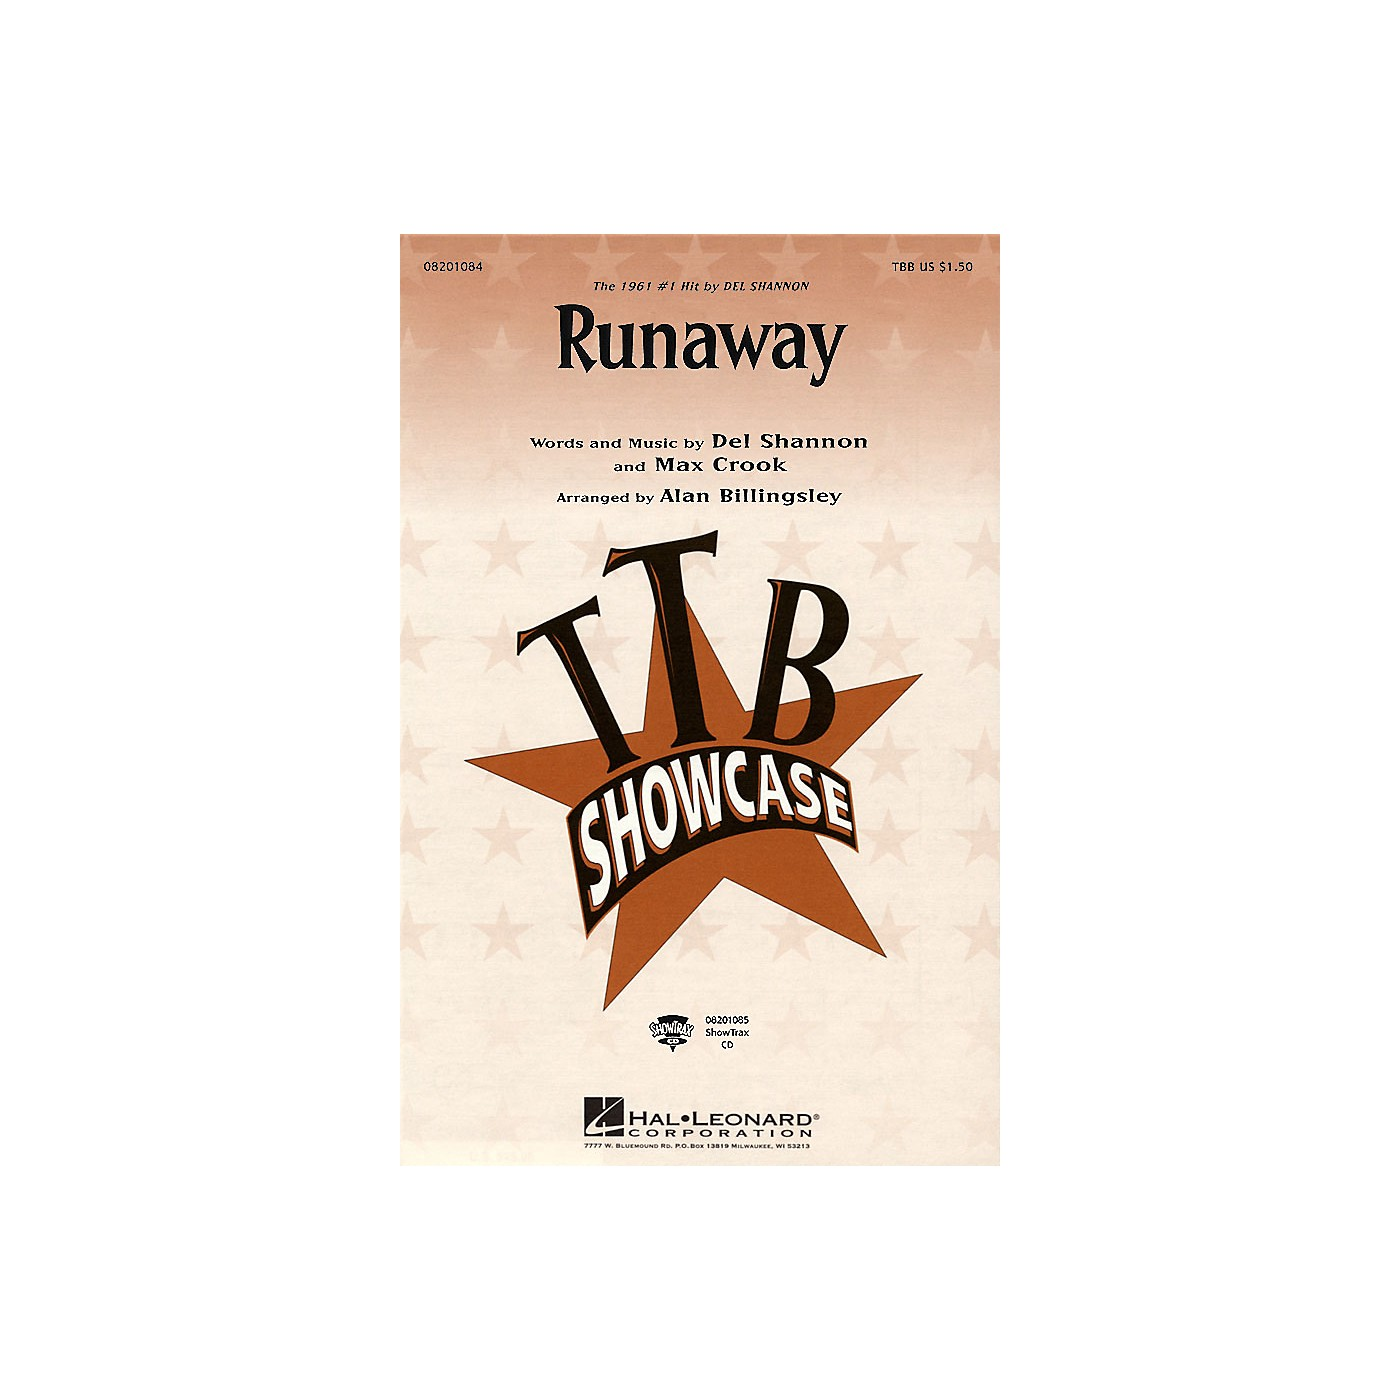 Hal Leonard Runaway ShowTrax CD by Del Shannon Arranged by Alan Billingsley thumbnail